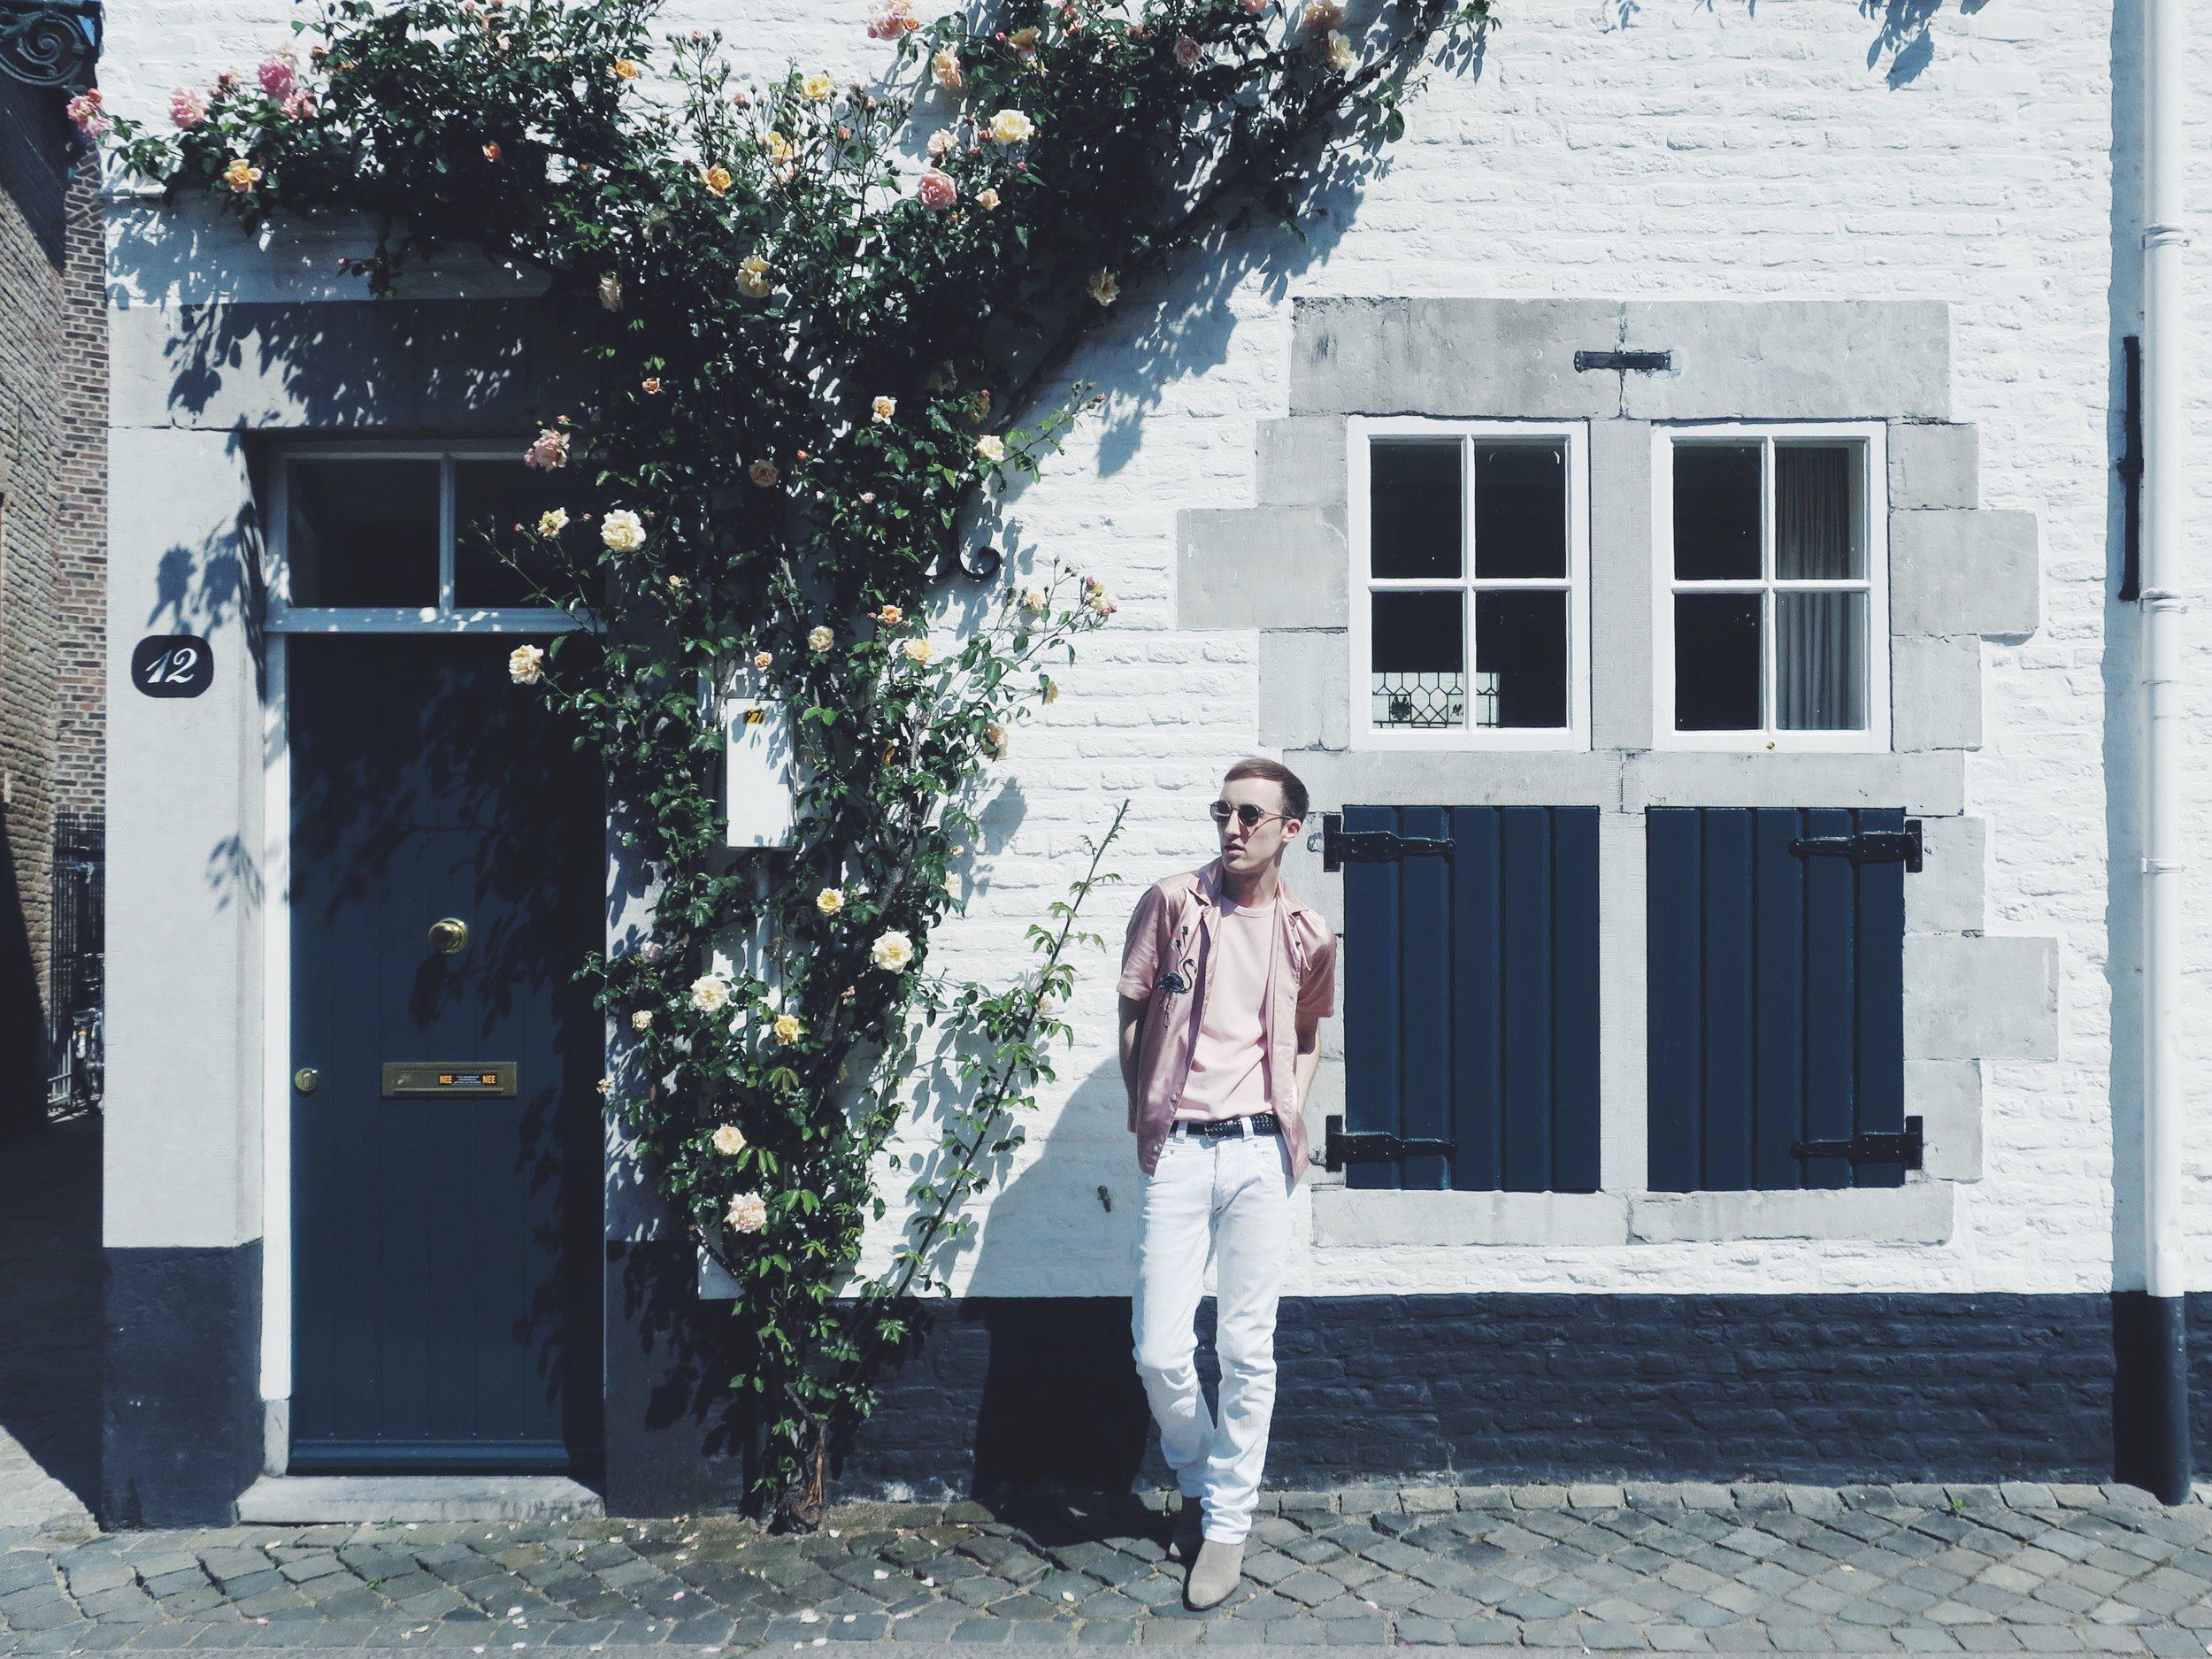 Diesel shirt - H&M t-shirt - Zara trousers - Zign ankle boots - Komono sunglasses